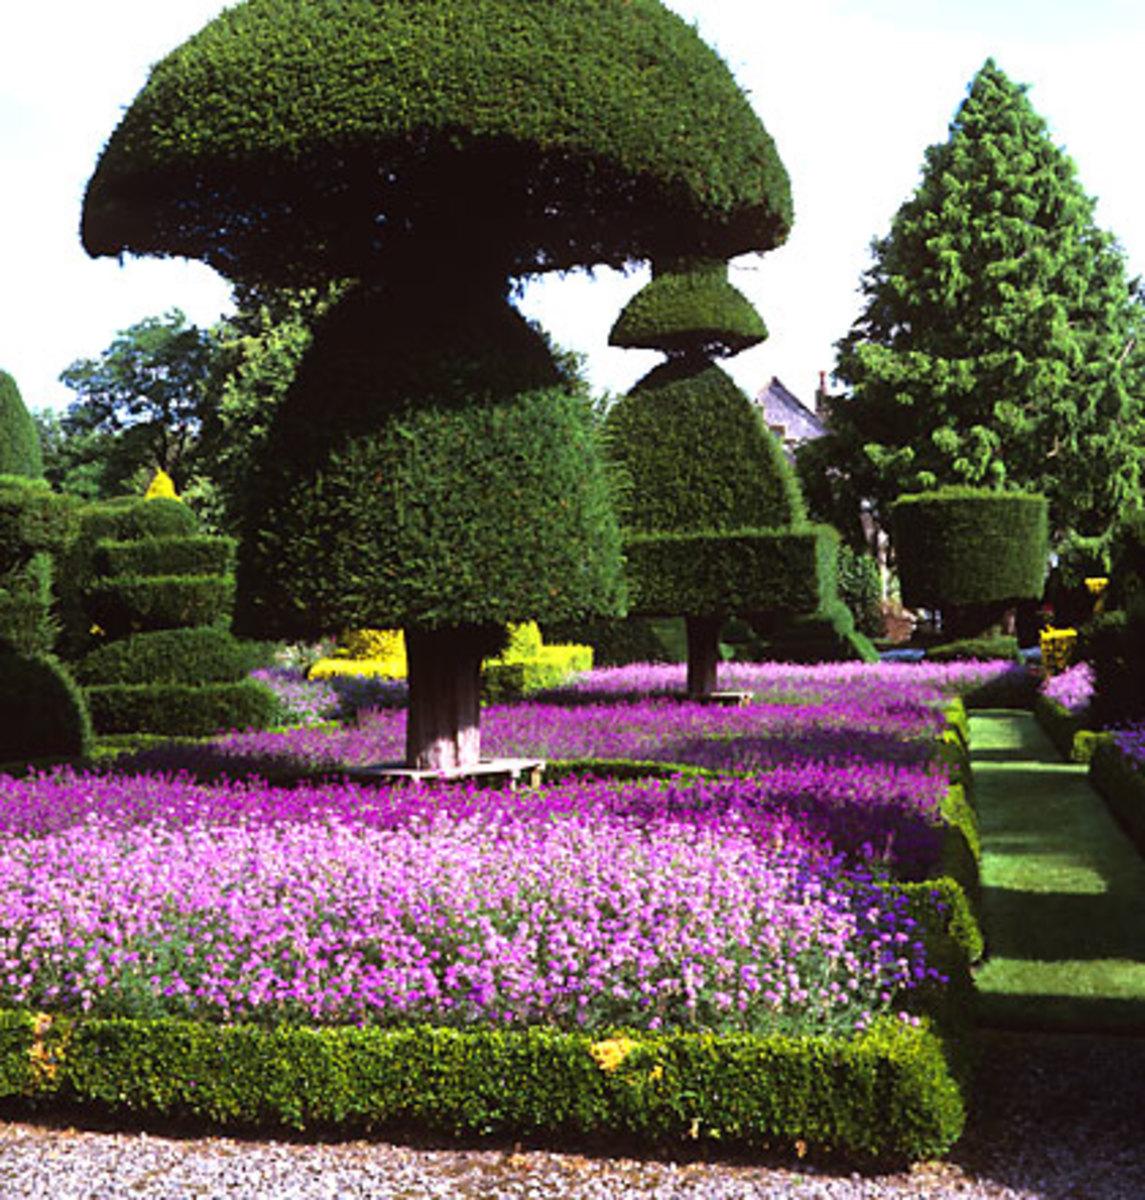 Photograph by Garden Collection